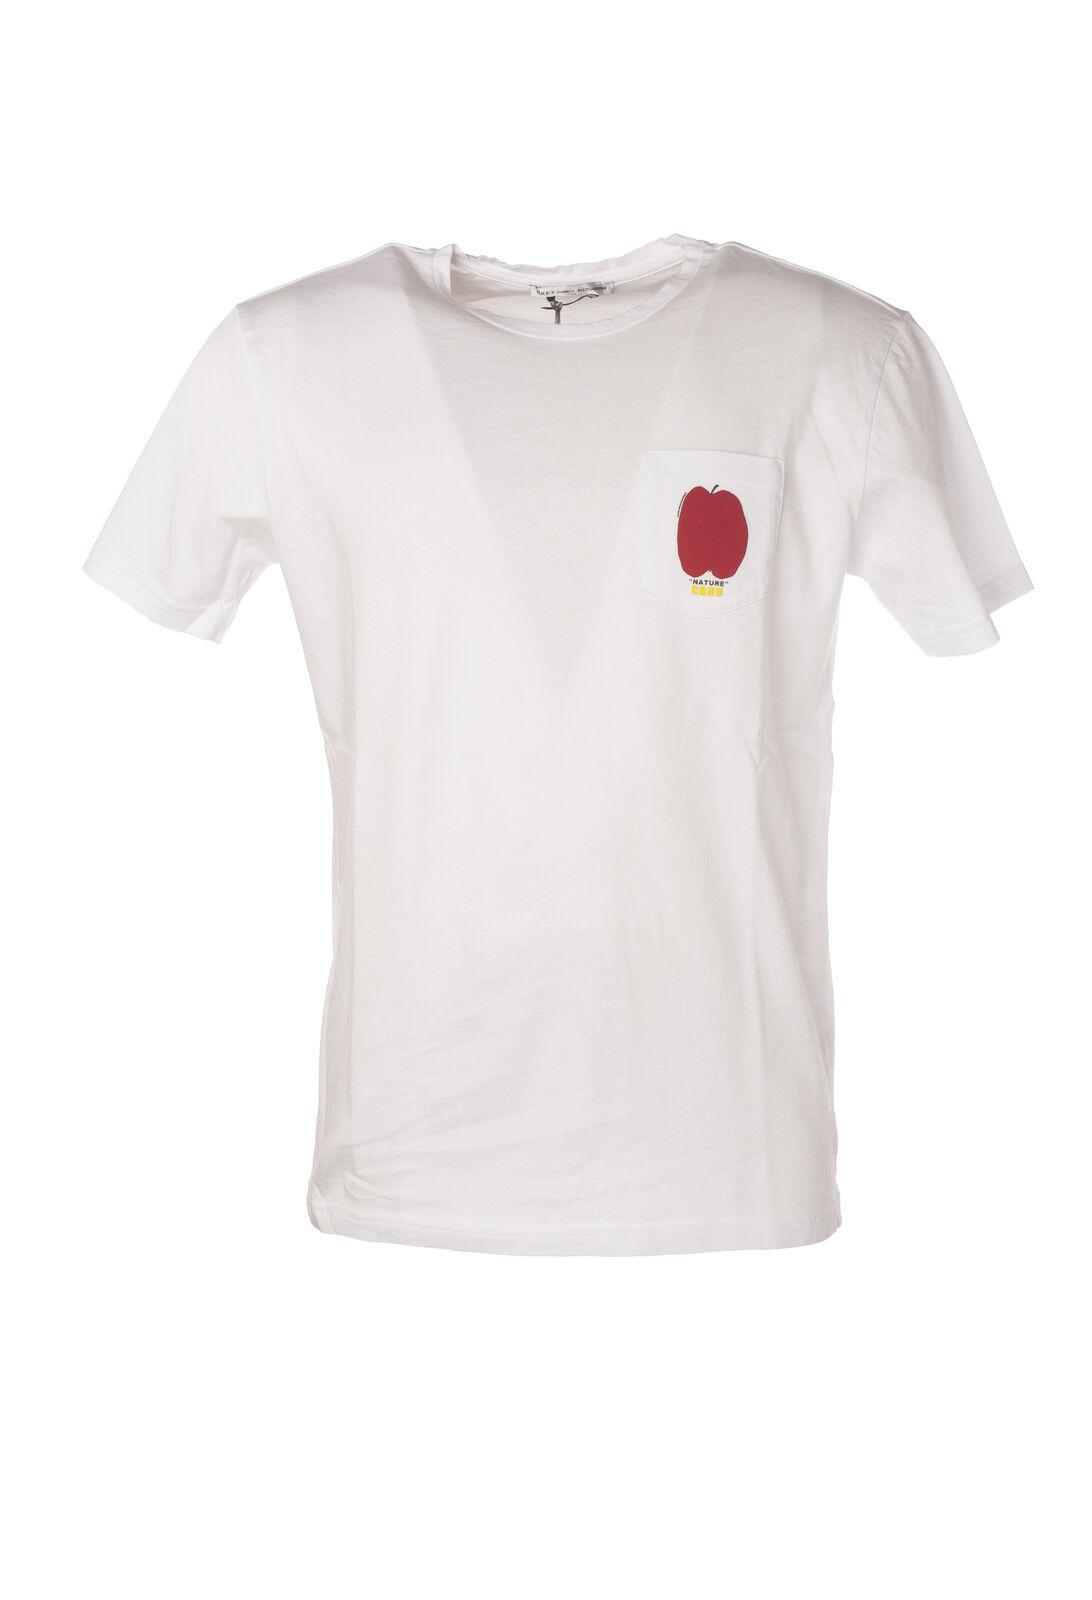 Daniele Alessandrini - Topwear-T-shirts - Man - White - 5905509C190759